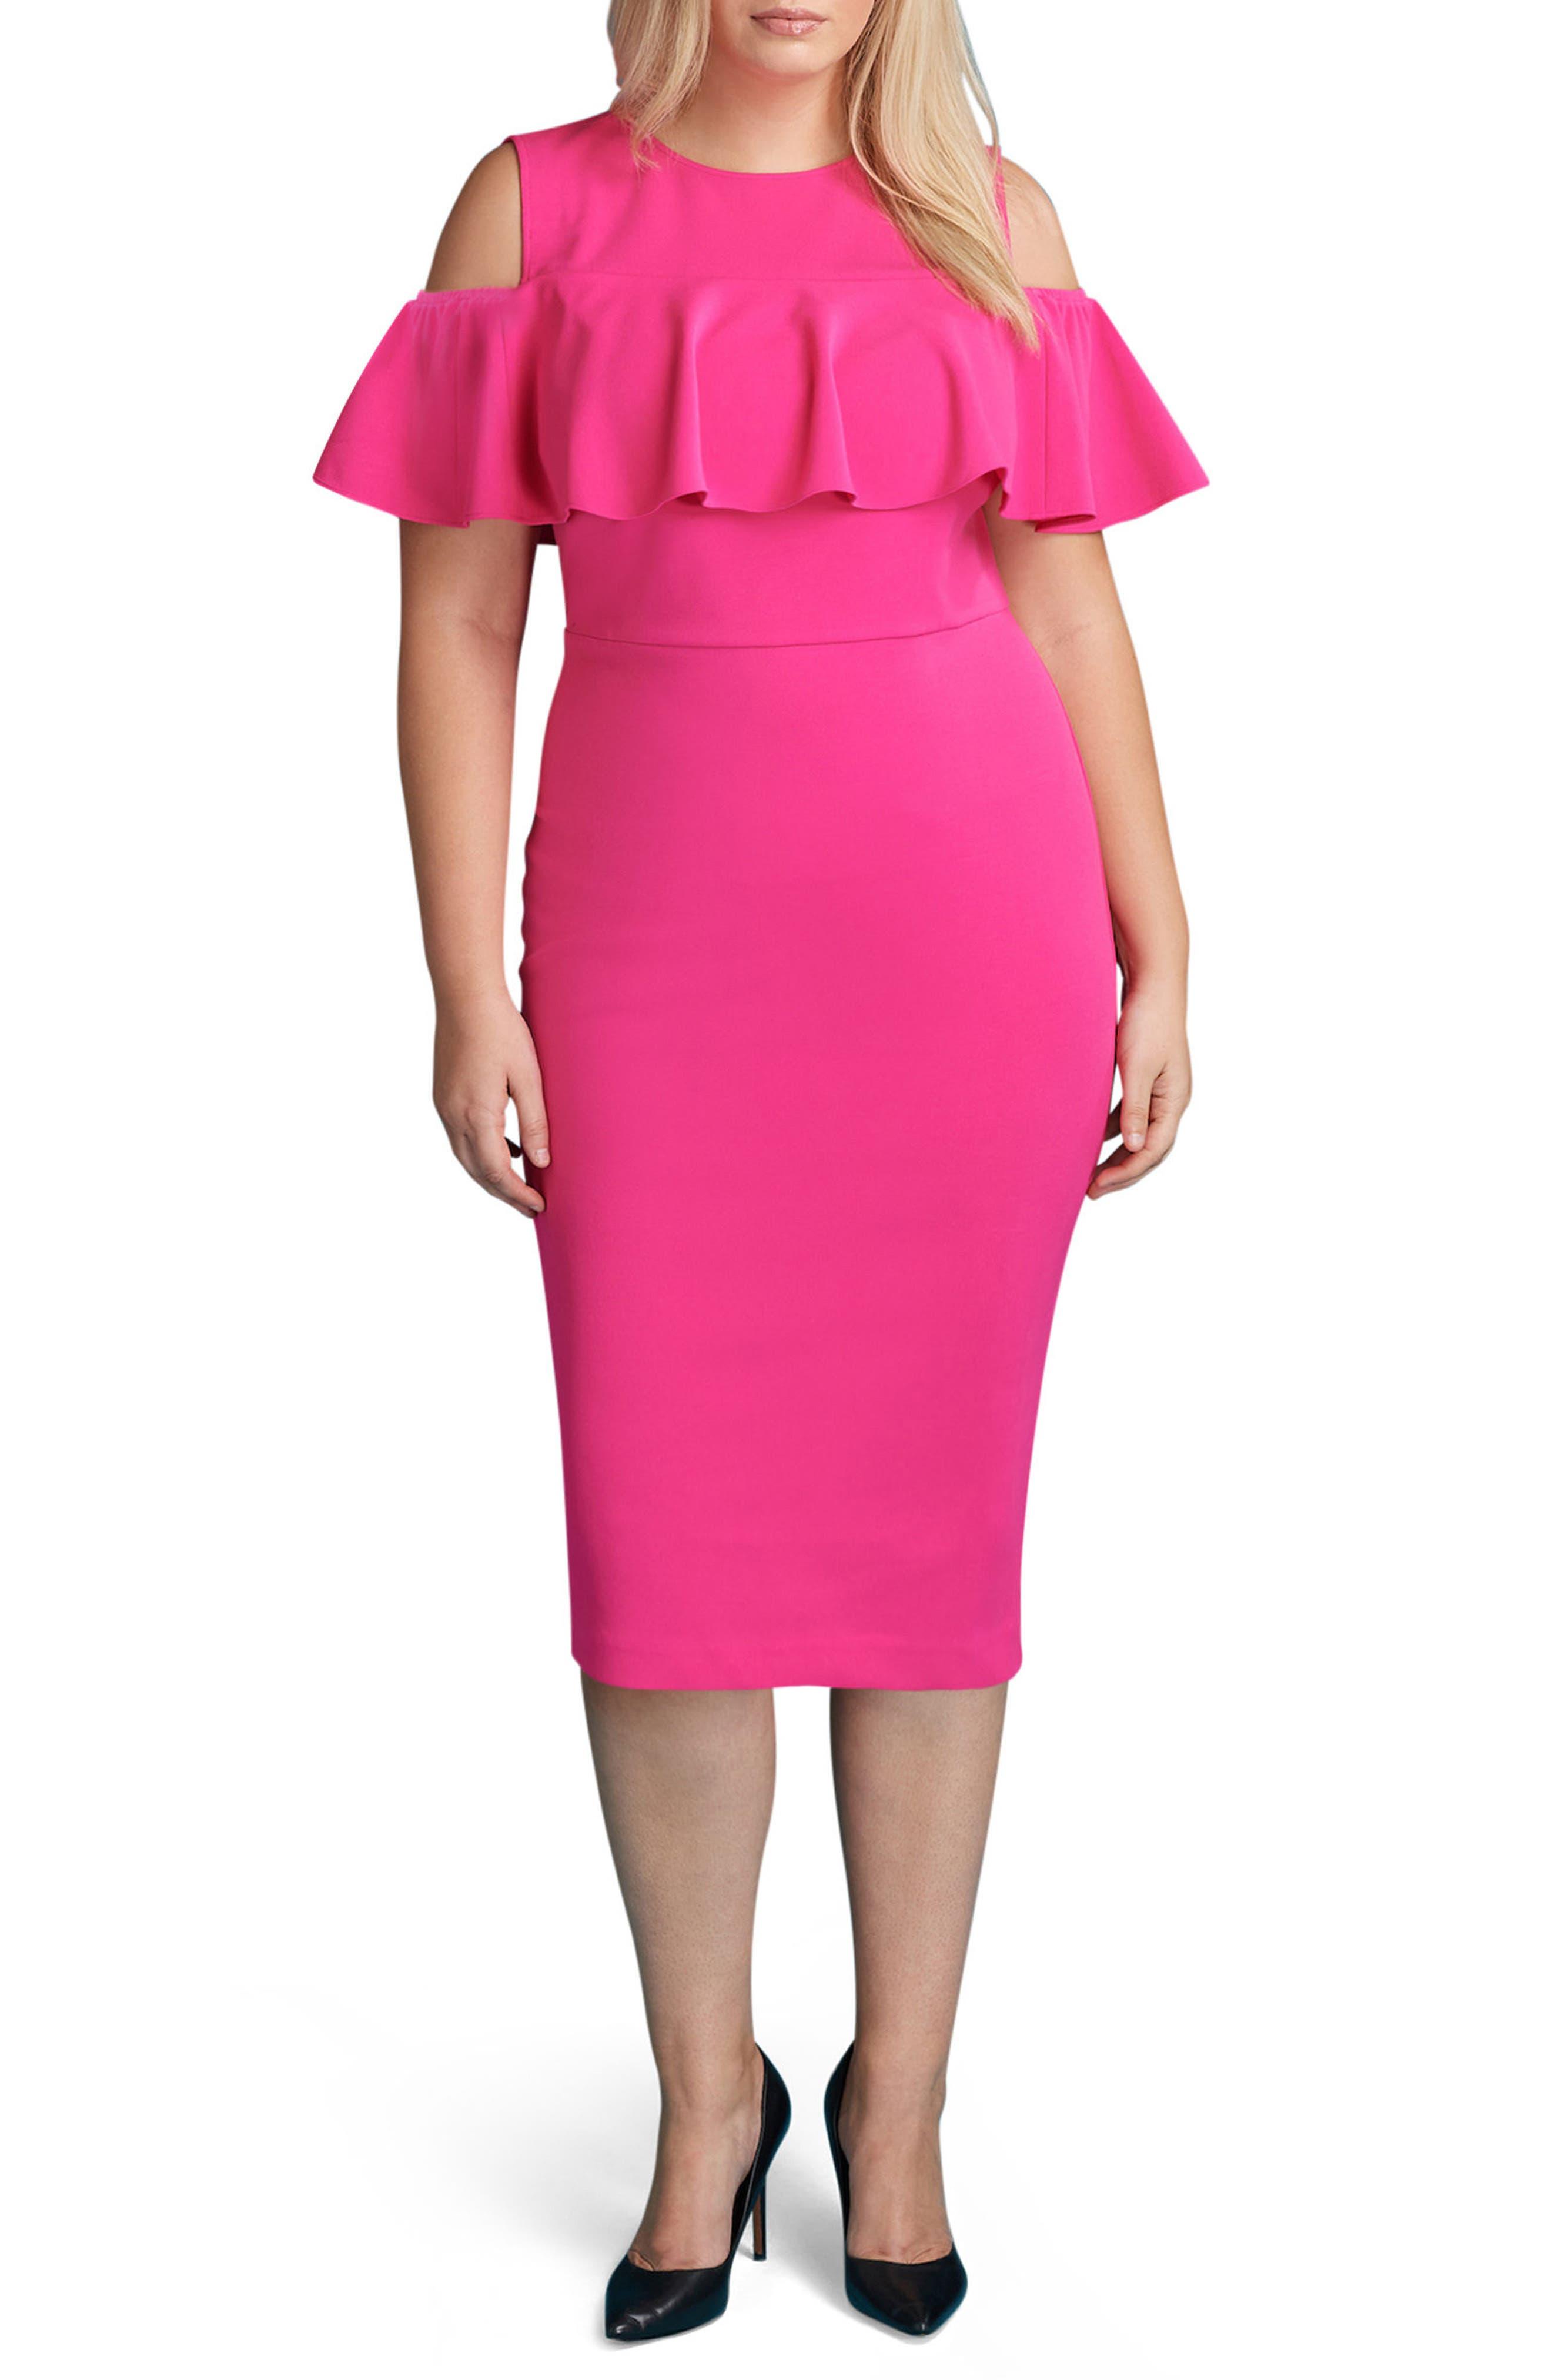 Alternate Image 1 Selected - ECI Cold Shoulder Ruffle Sheath Dress (Plus Size)